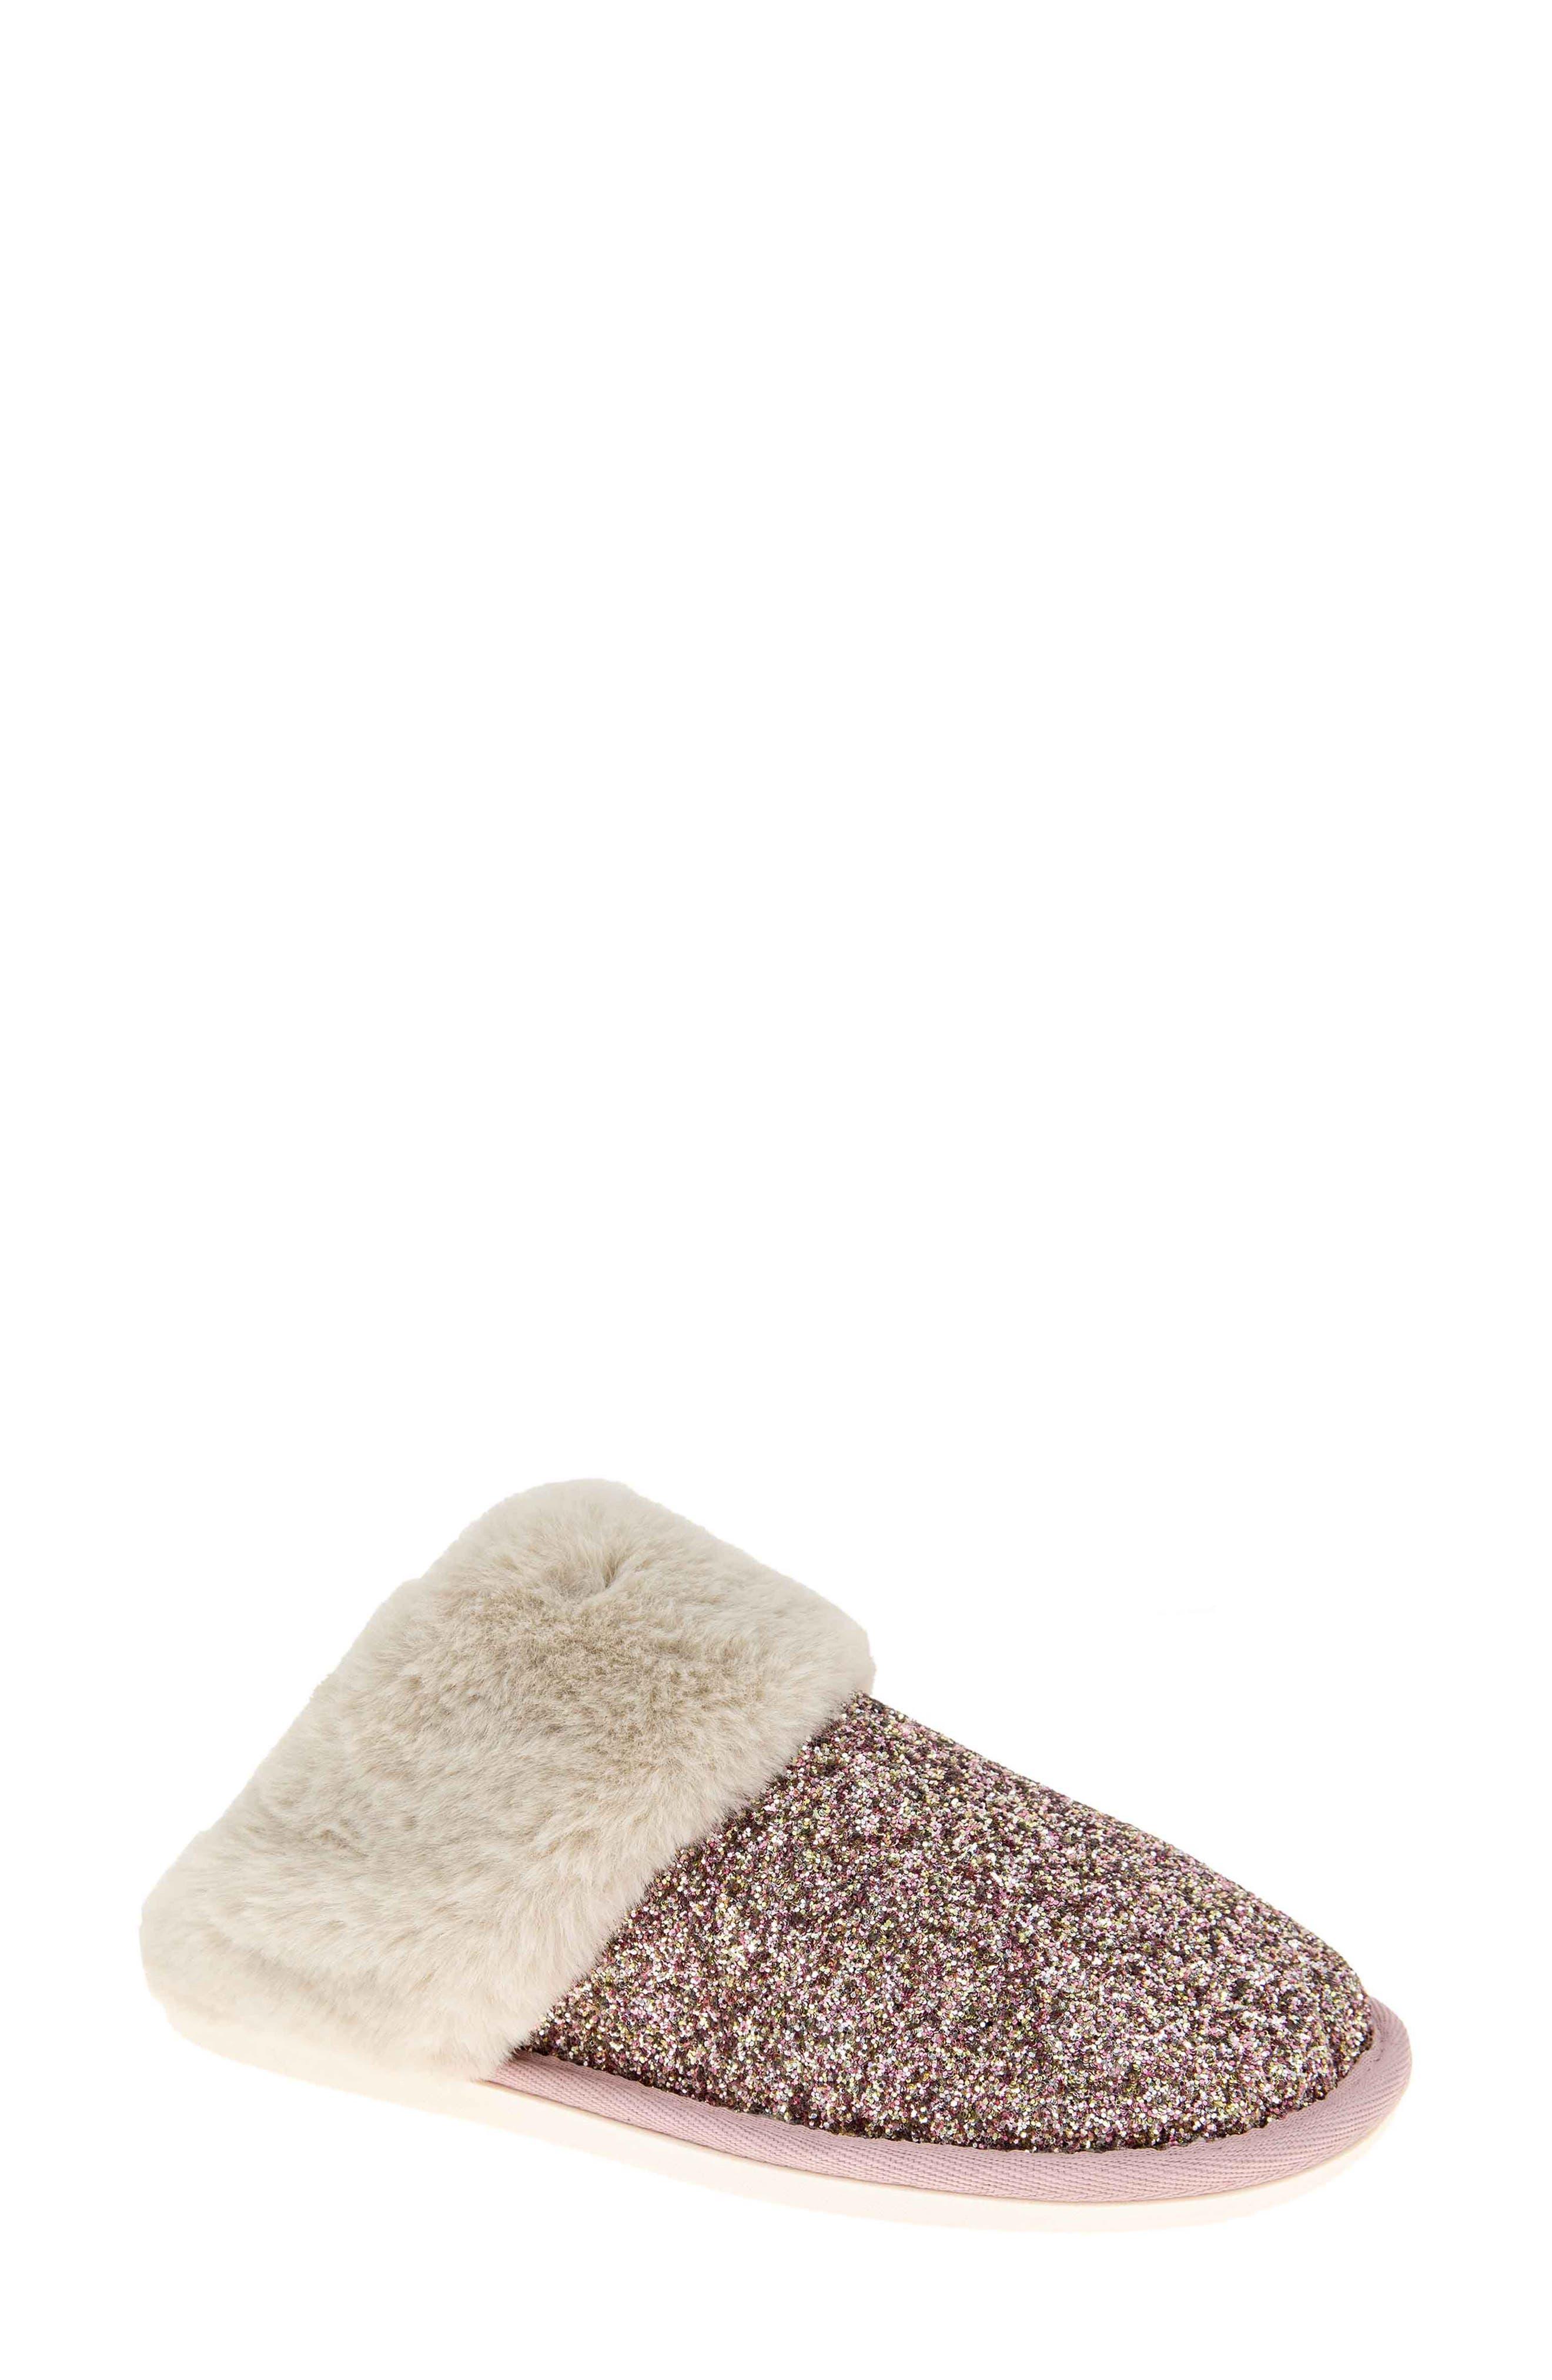 Tria Faux Fur Lined Slipper